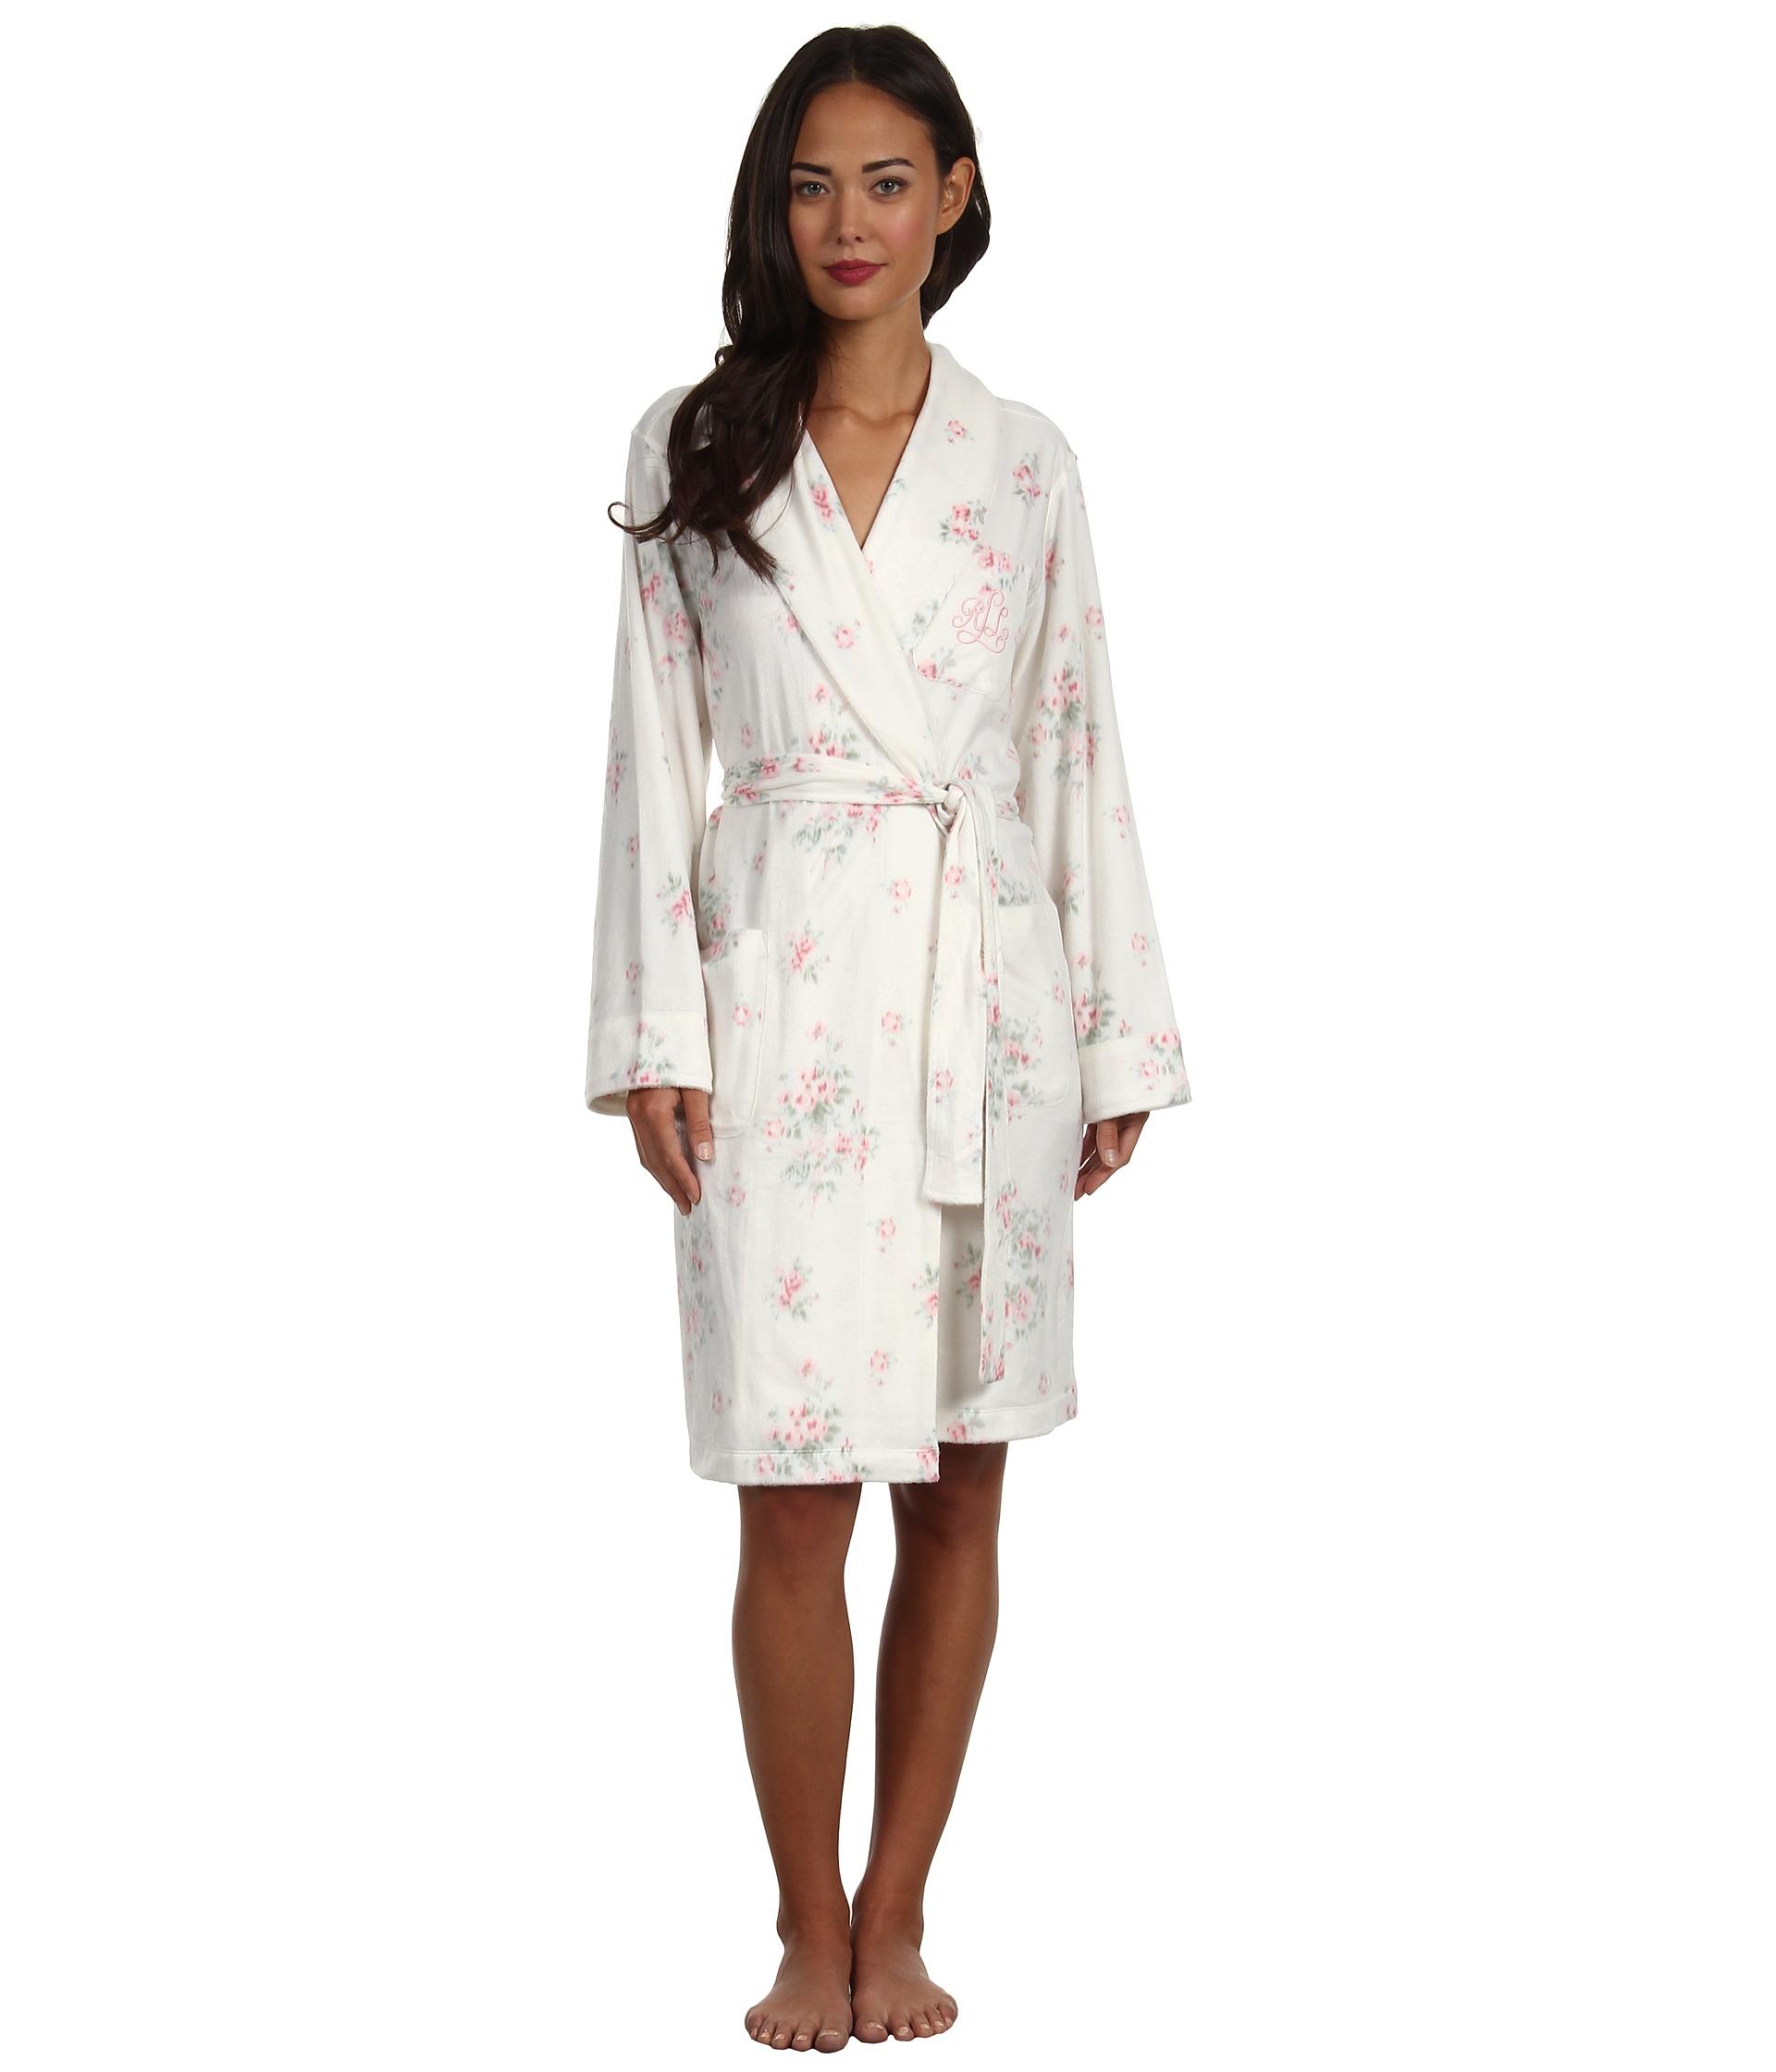 lauren ralph lauren dangerous liaisons short shawl collar robe camille floral shipped free at. Black Bedroom Furniture Sets. Home Design Ideas